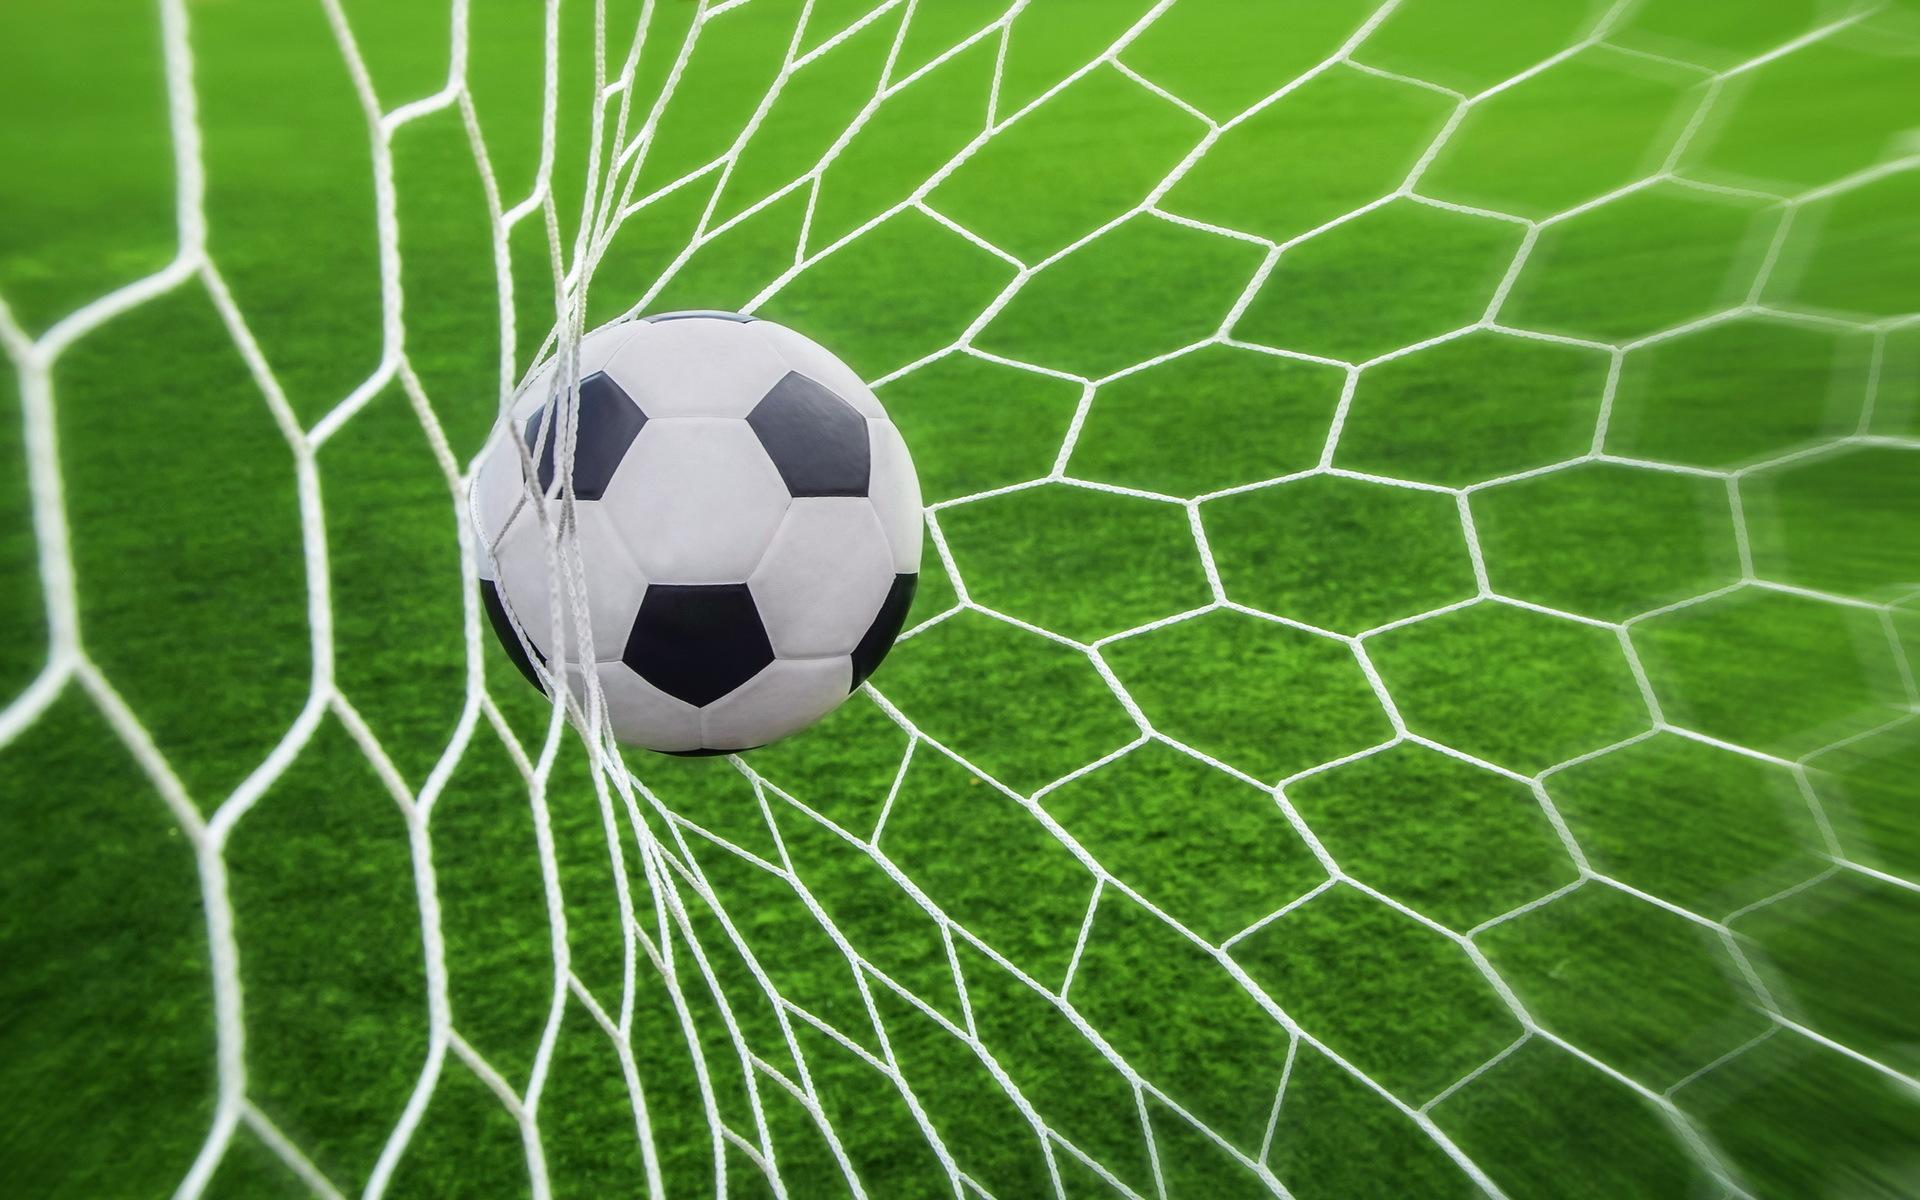 HD Wallpapers Soccer Goal